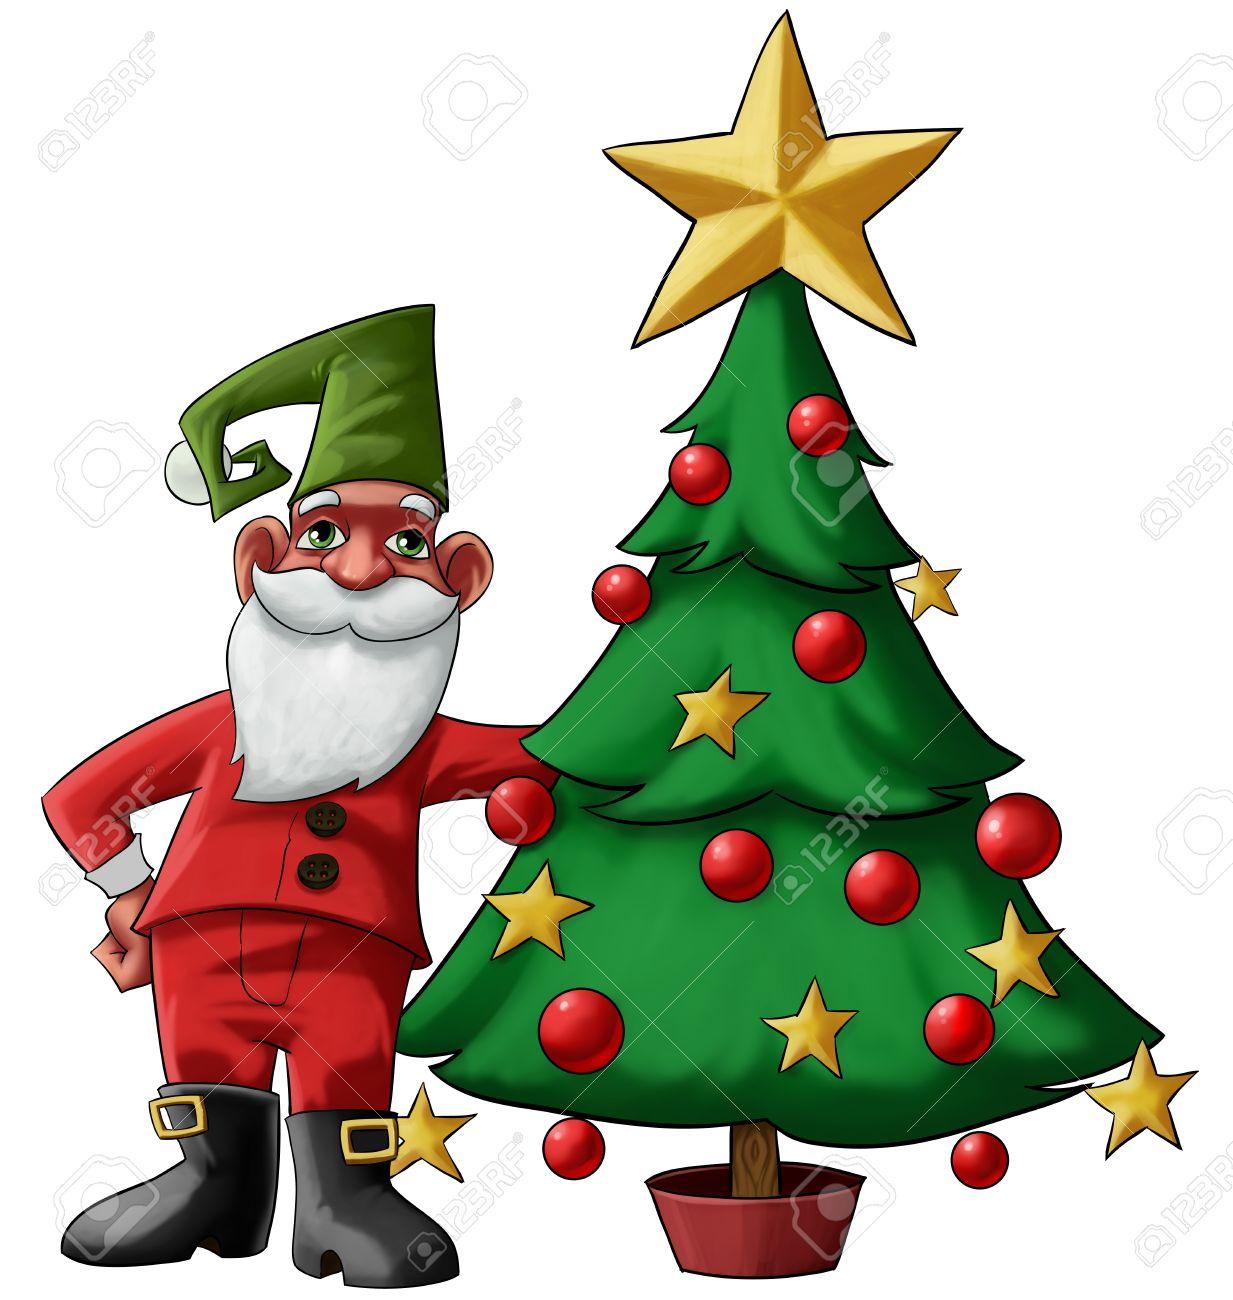 santa claus gnome near to a christmas tree - Santa Claus Tree